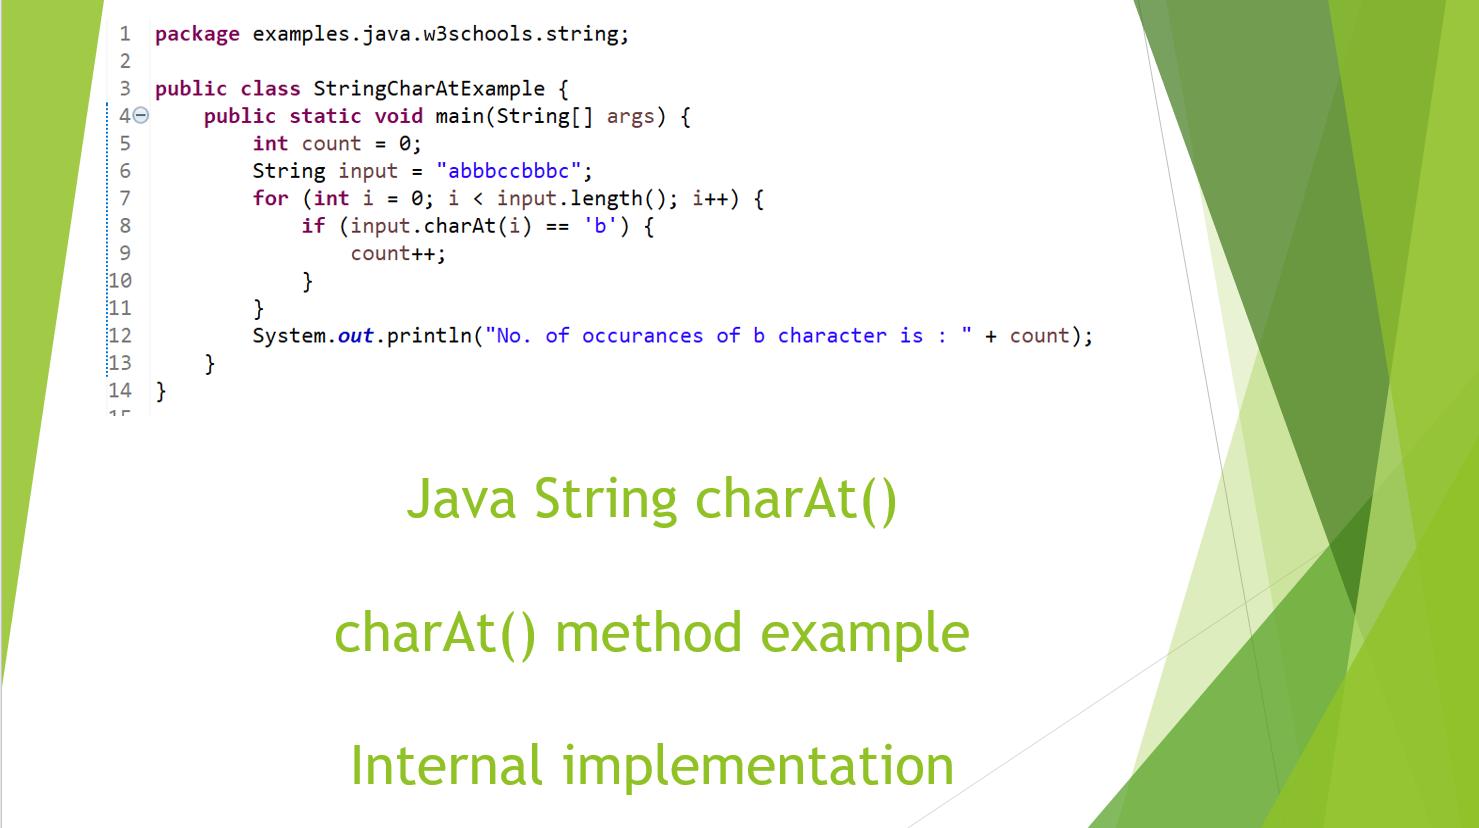 Java String charAt() Method example - Java-W3schools